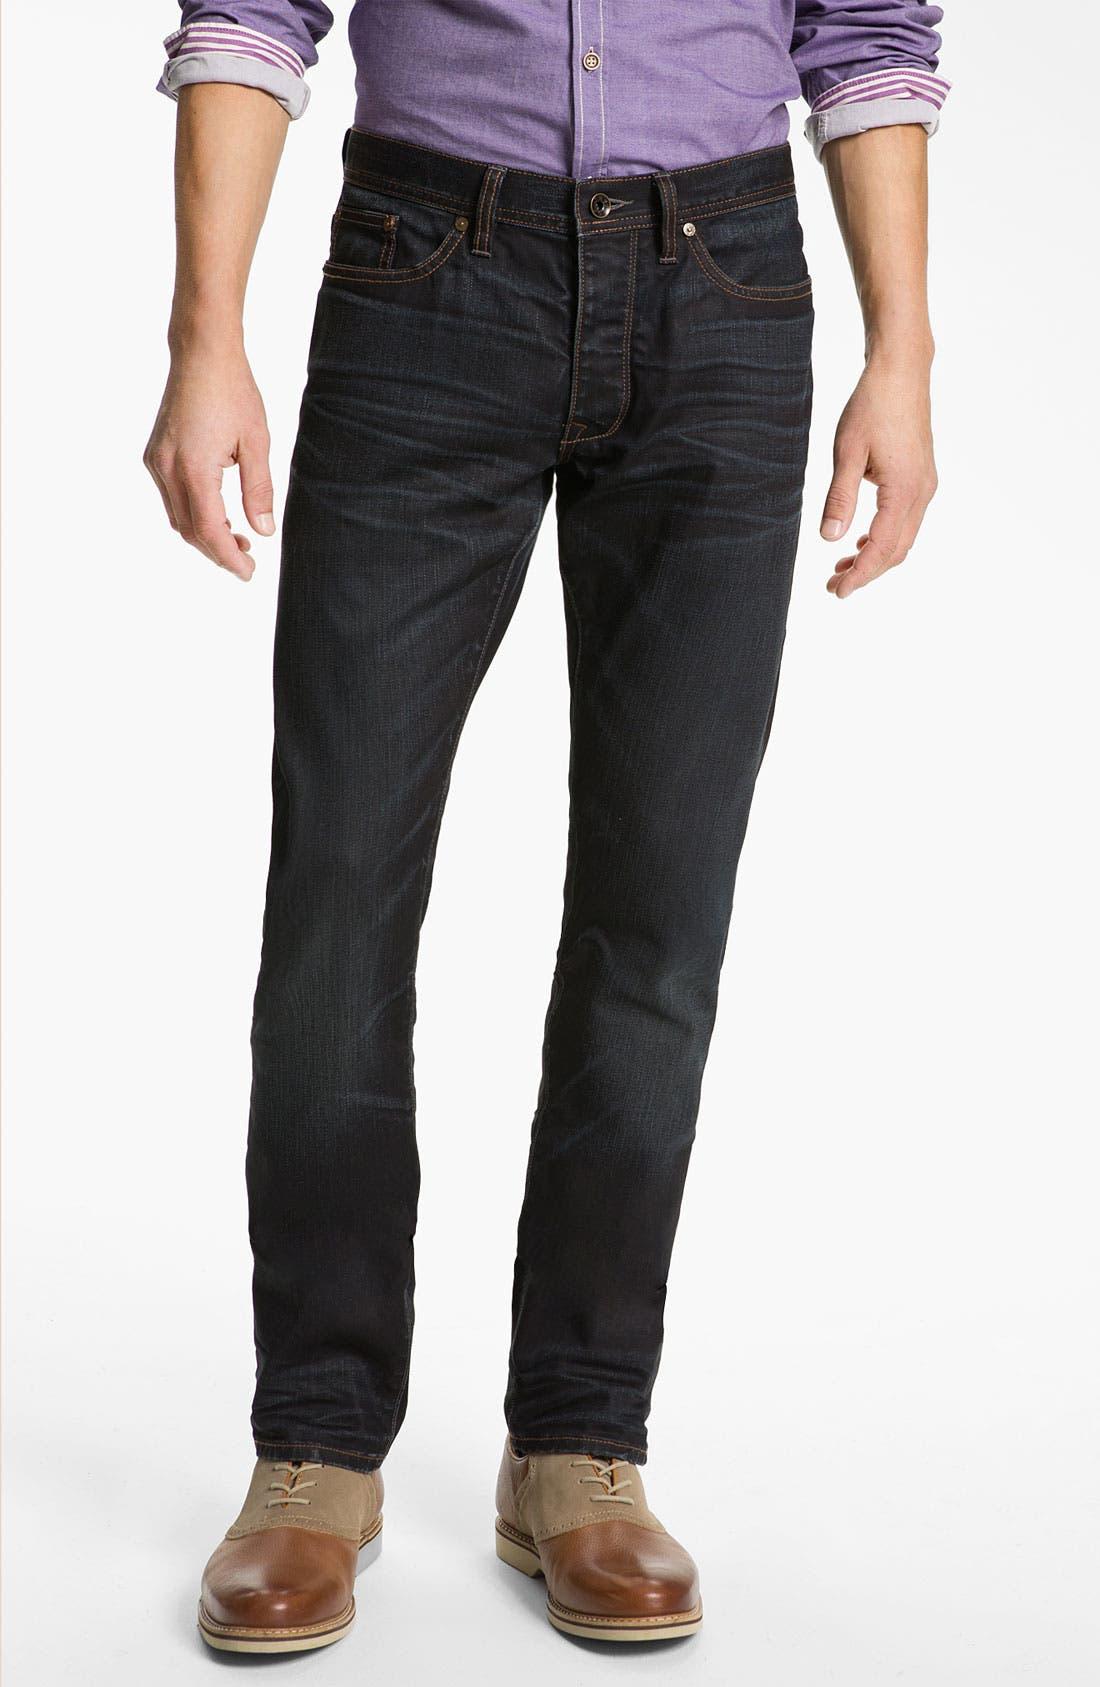 Main Image - John Varvatos 'Bowery' Slim Straight Leg Jeans (Ink)